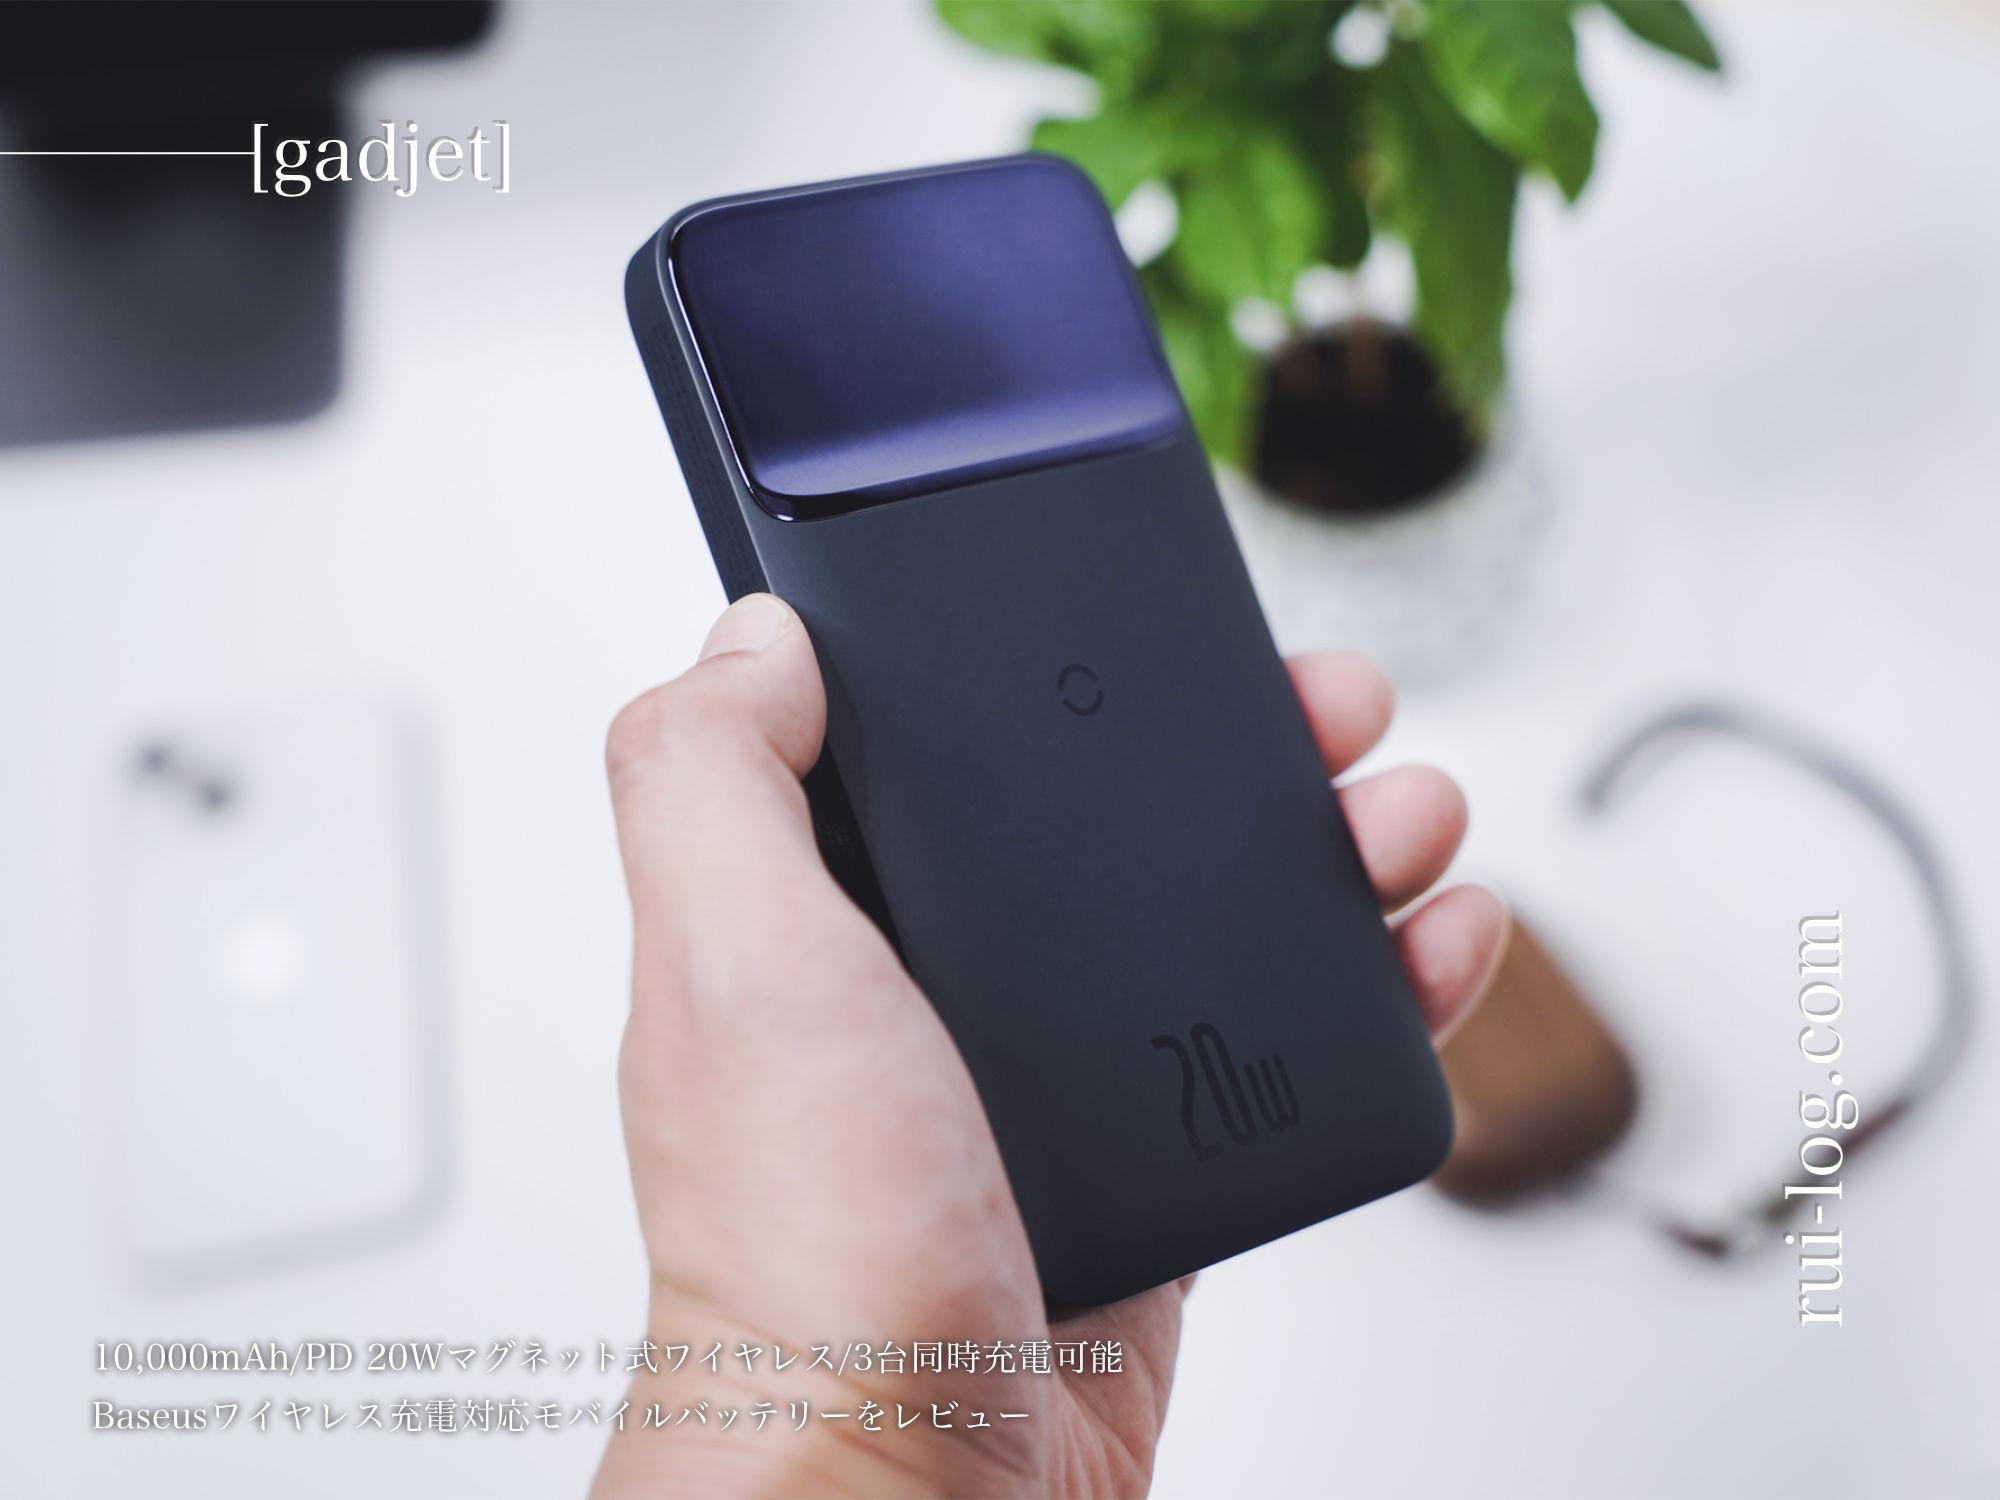 Baseusワイヤレス充電対応モバイルバッテリーをルイログがレビュー